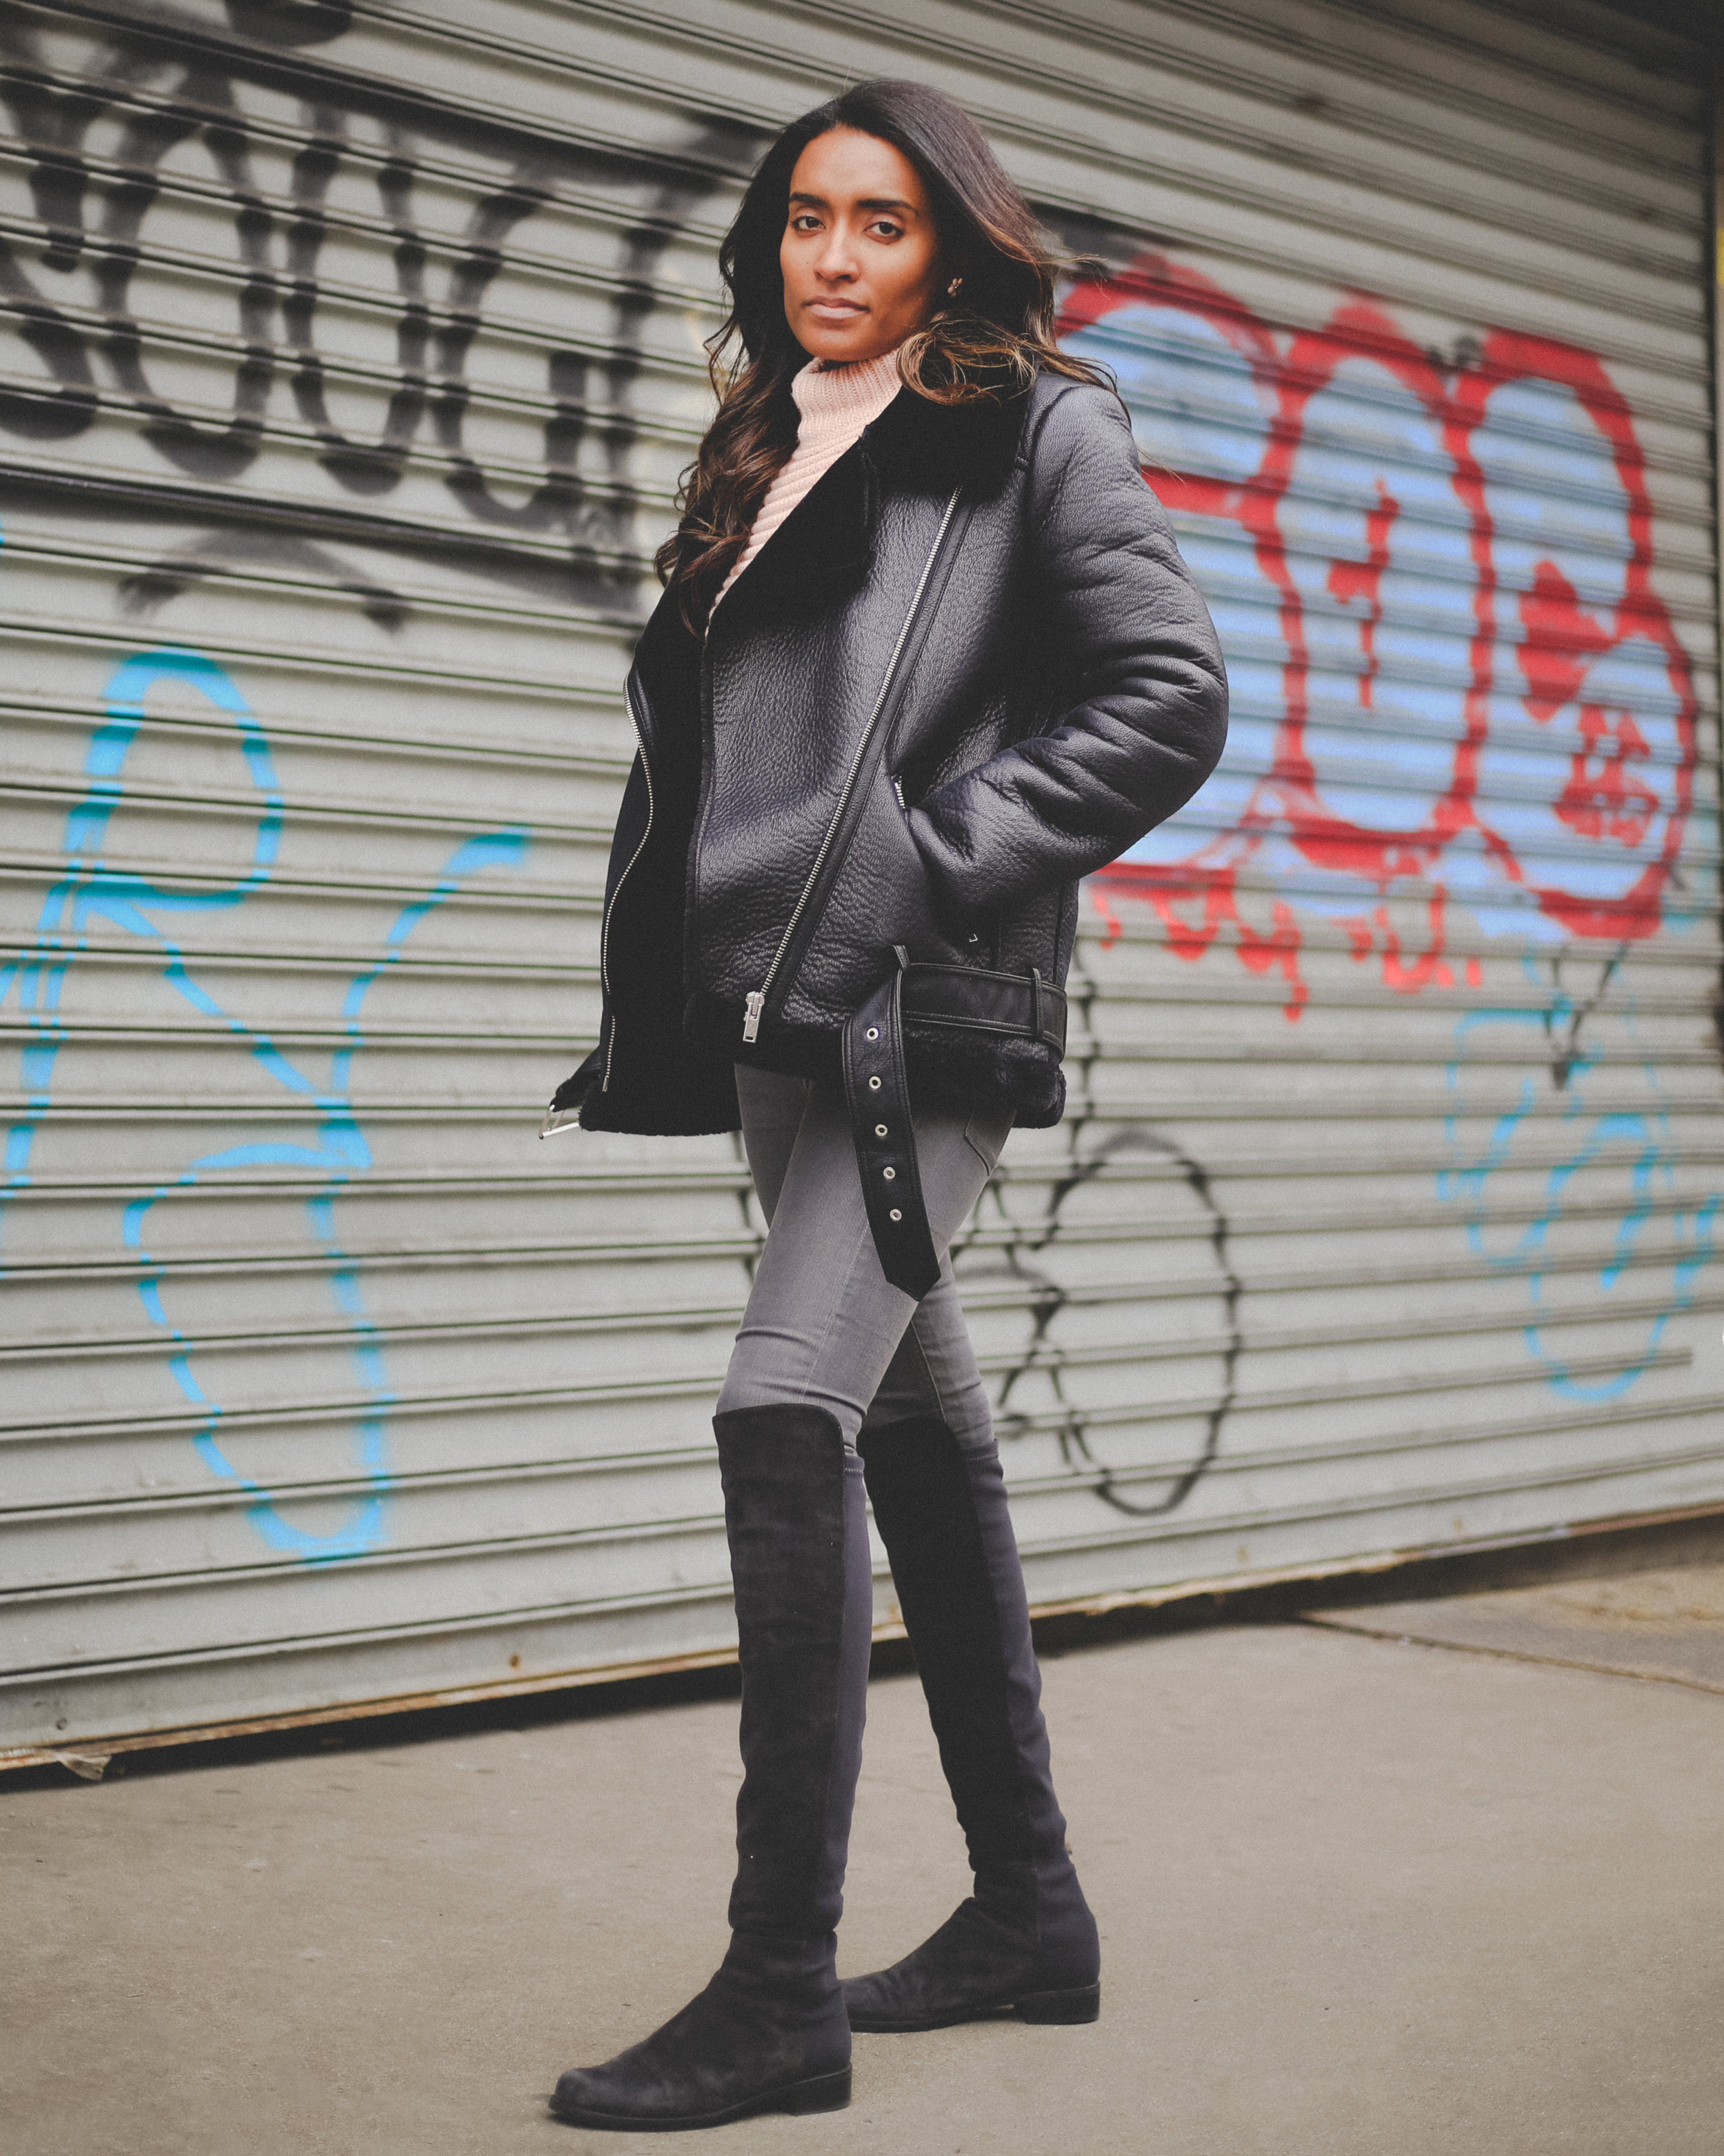 Krys is posing  with a Zara Motorcycle jacket.